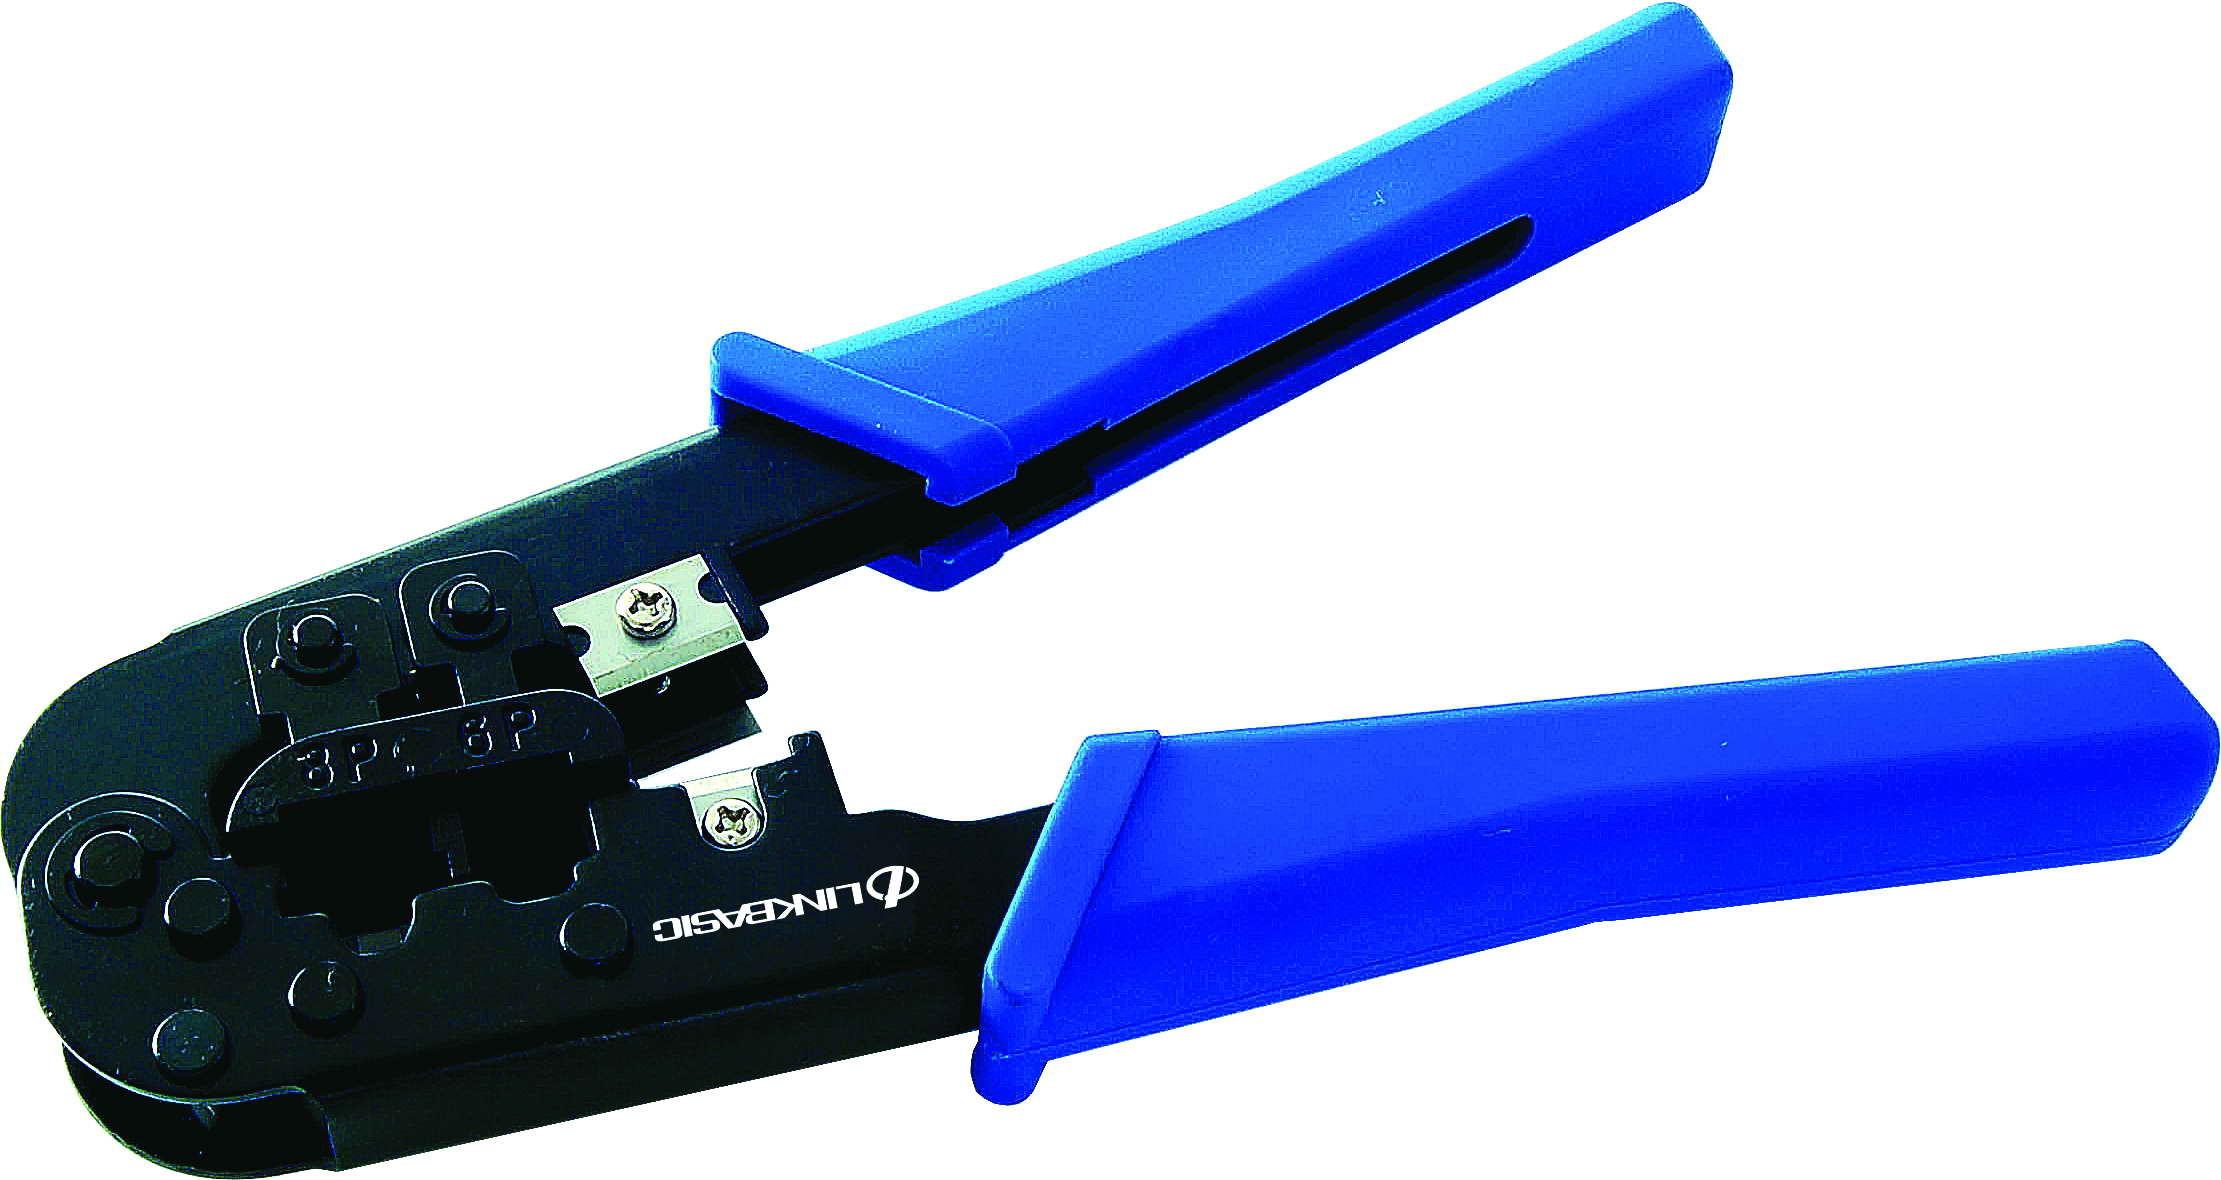 china rj45 and rj11 crimp tools china crimp tools cable. Black Bedroom Furniture Sets. Home Design Ideas